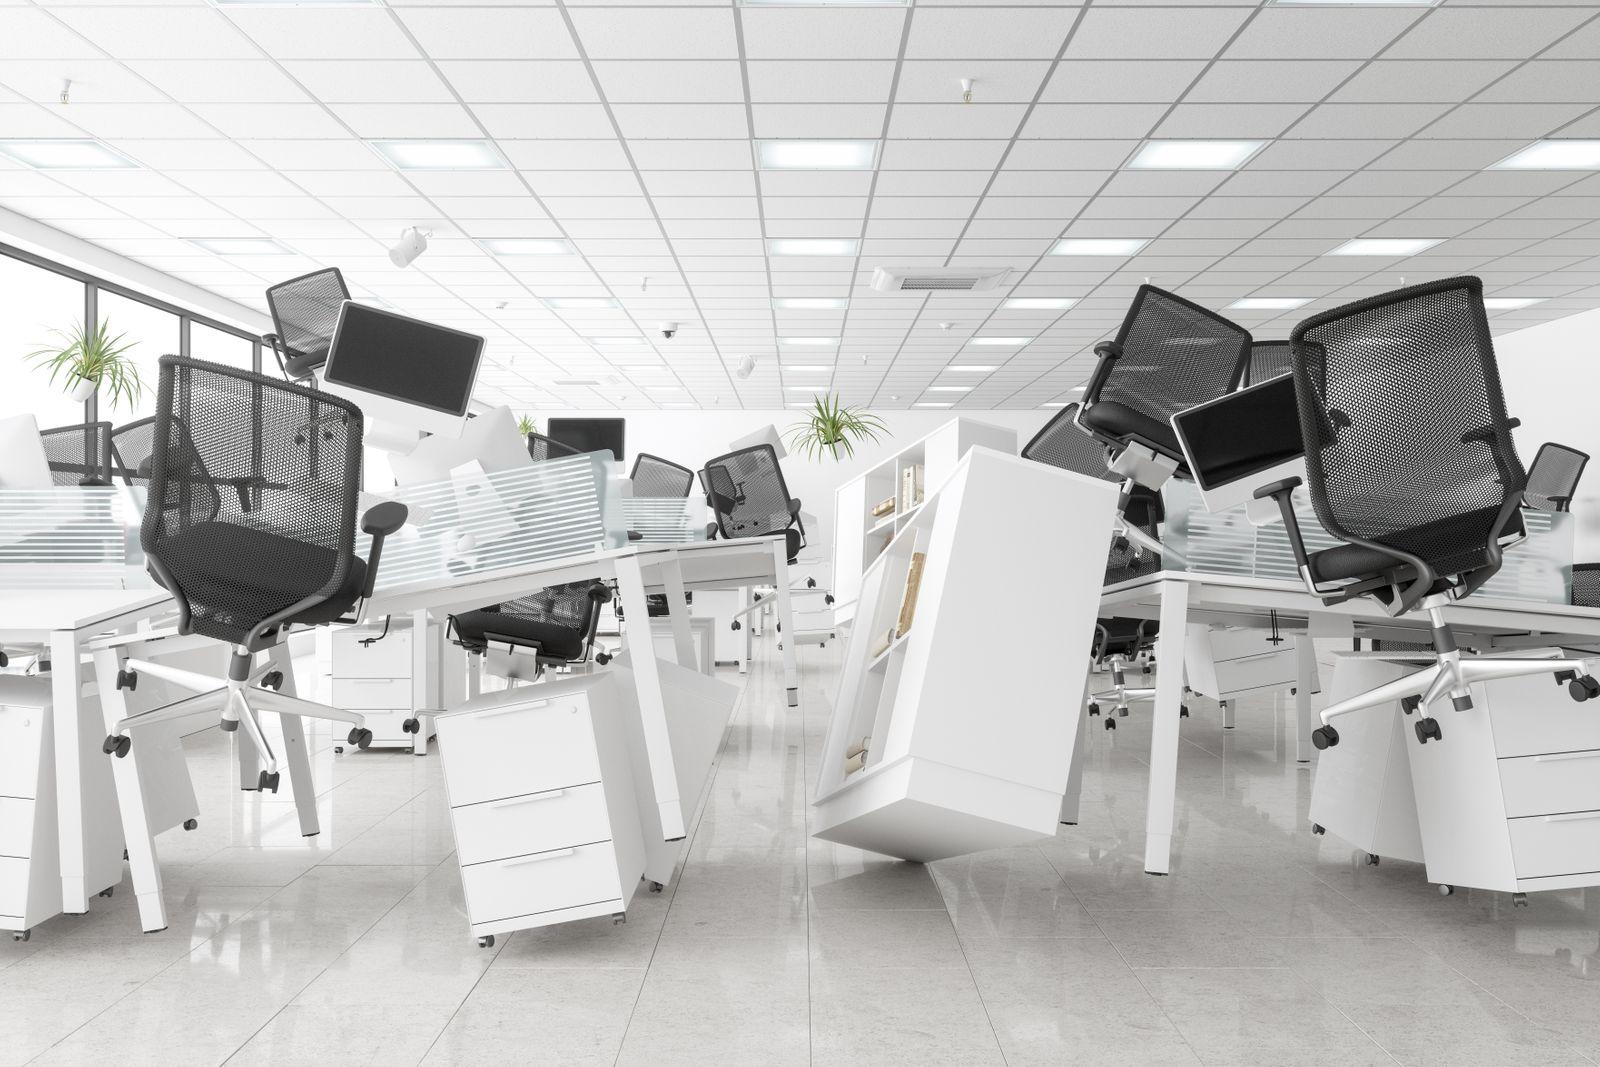 Zero Gravity Open Space Office